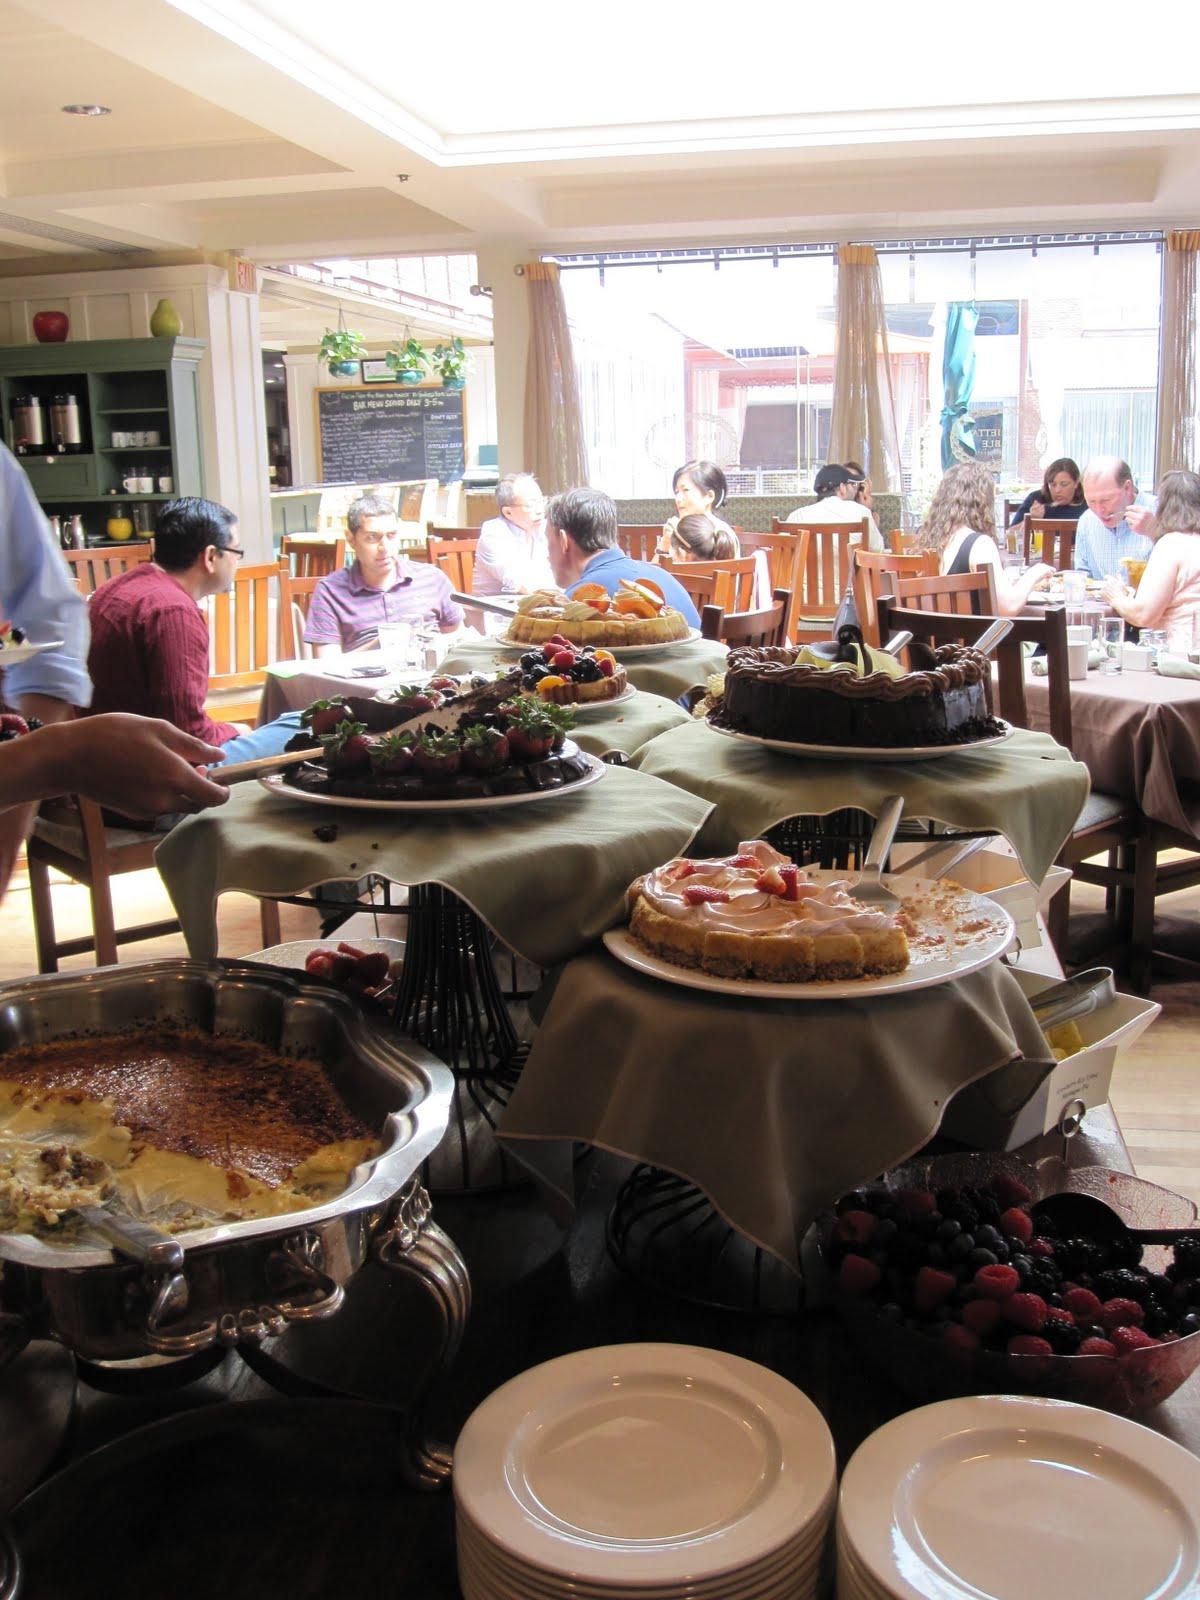 the quest for the perfect brunch henrietta s table cambridge ma rh perfectbrunch blogspot com